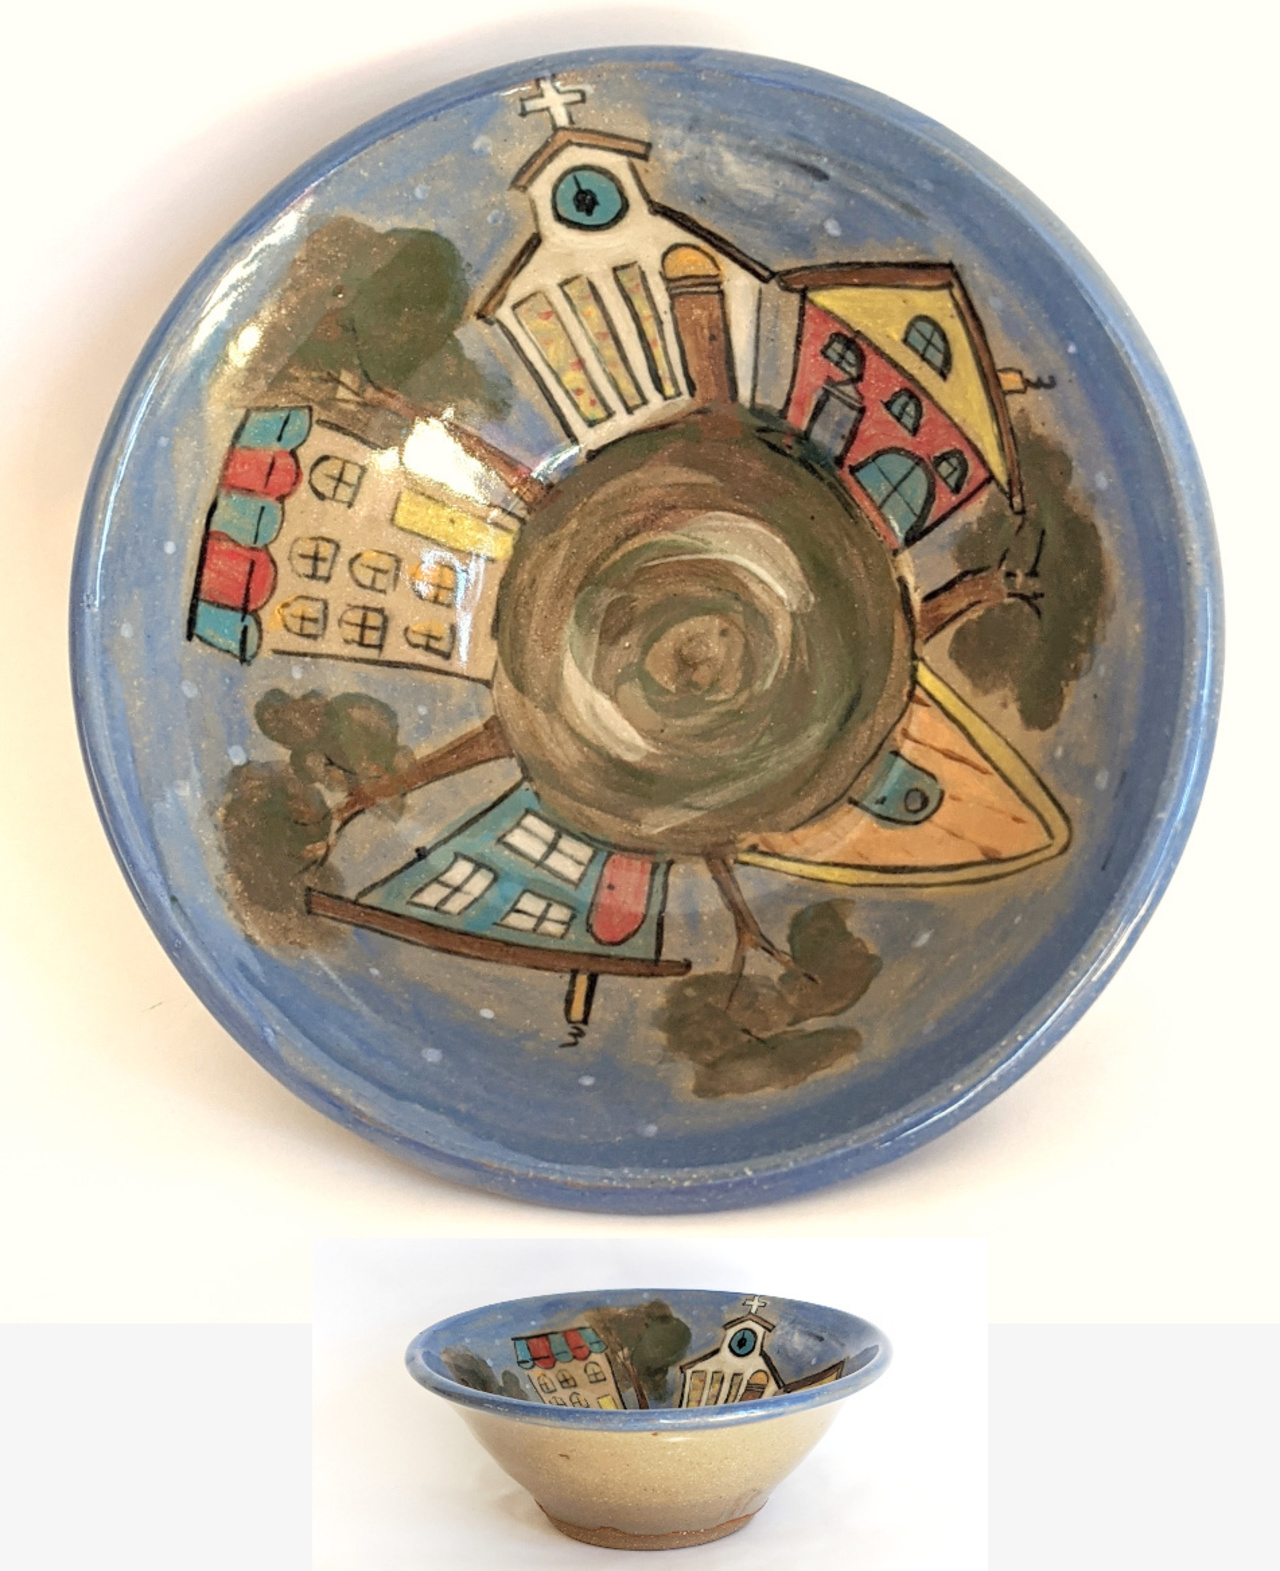 City bowl